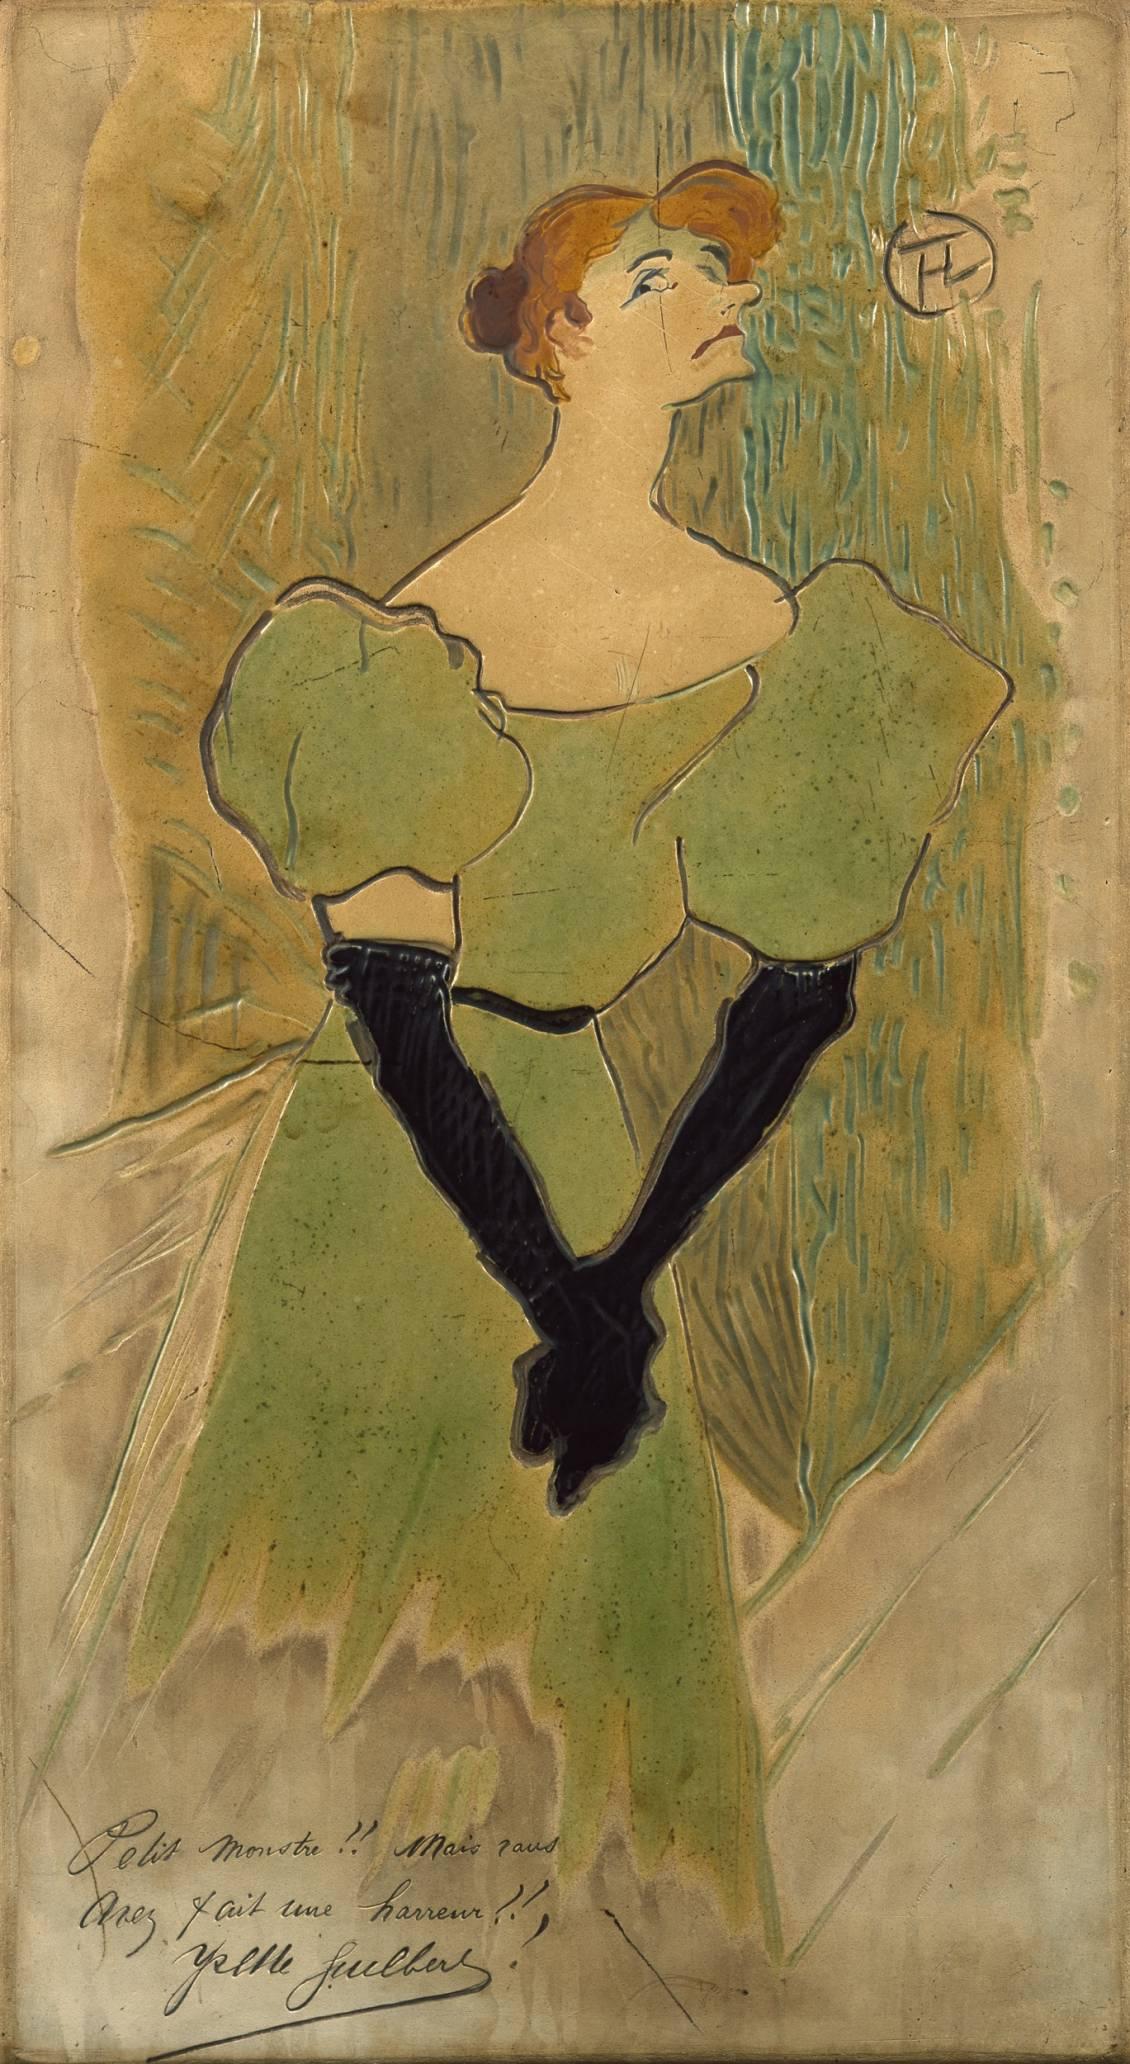 Henri de Toulouse-Lautrec, Yvette Guilbert, 1895